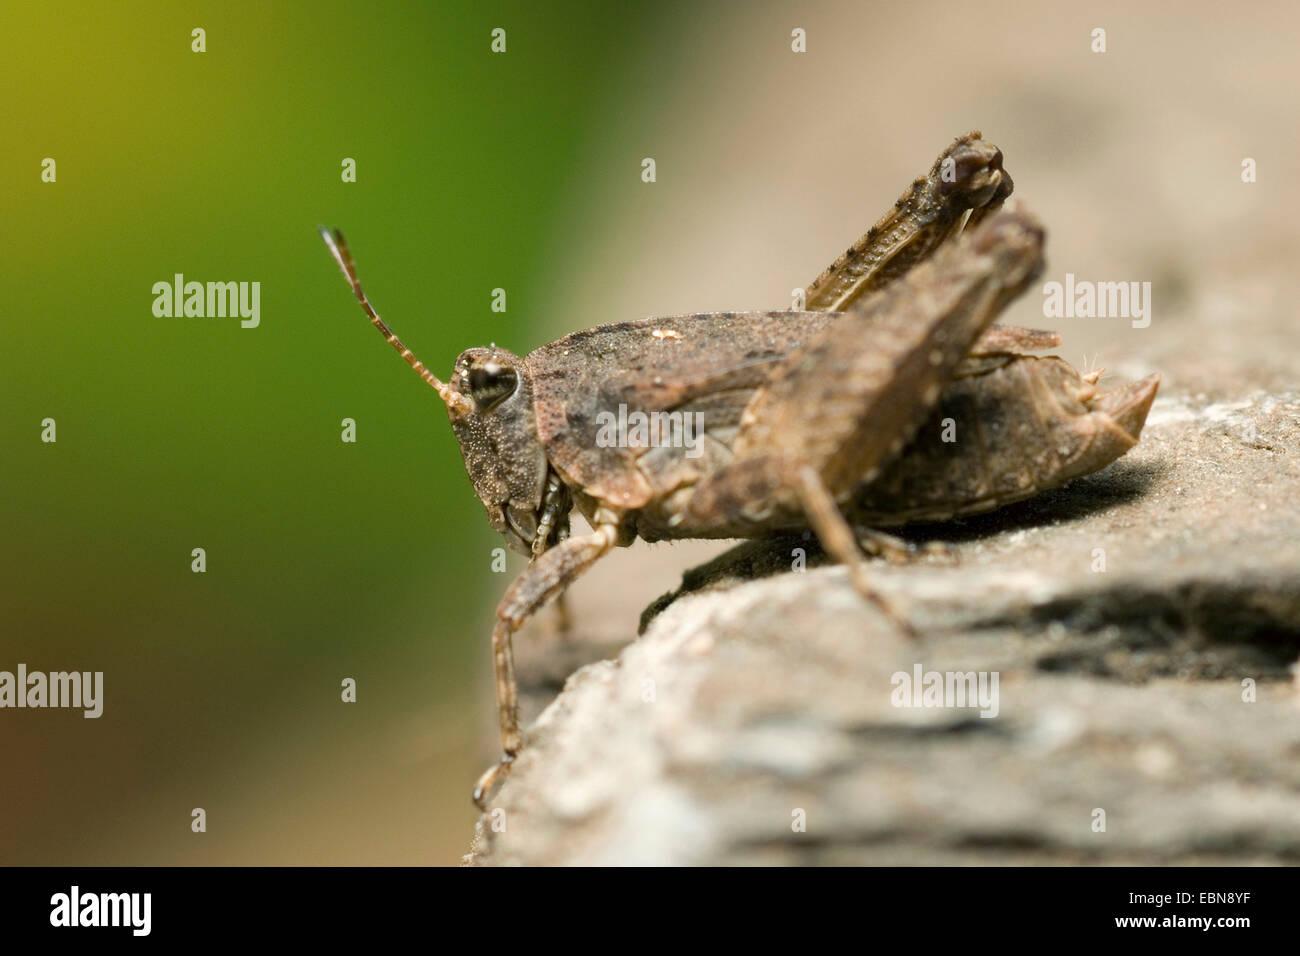 Longhorned groundhopper (Tetrix tenuicornis, Tetrix natans), sitting on a stone, Germany - Stock Image